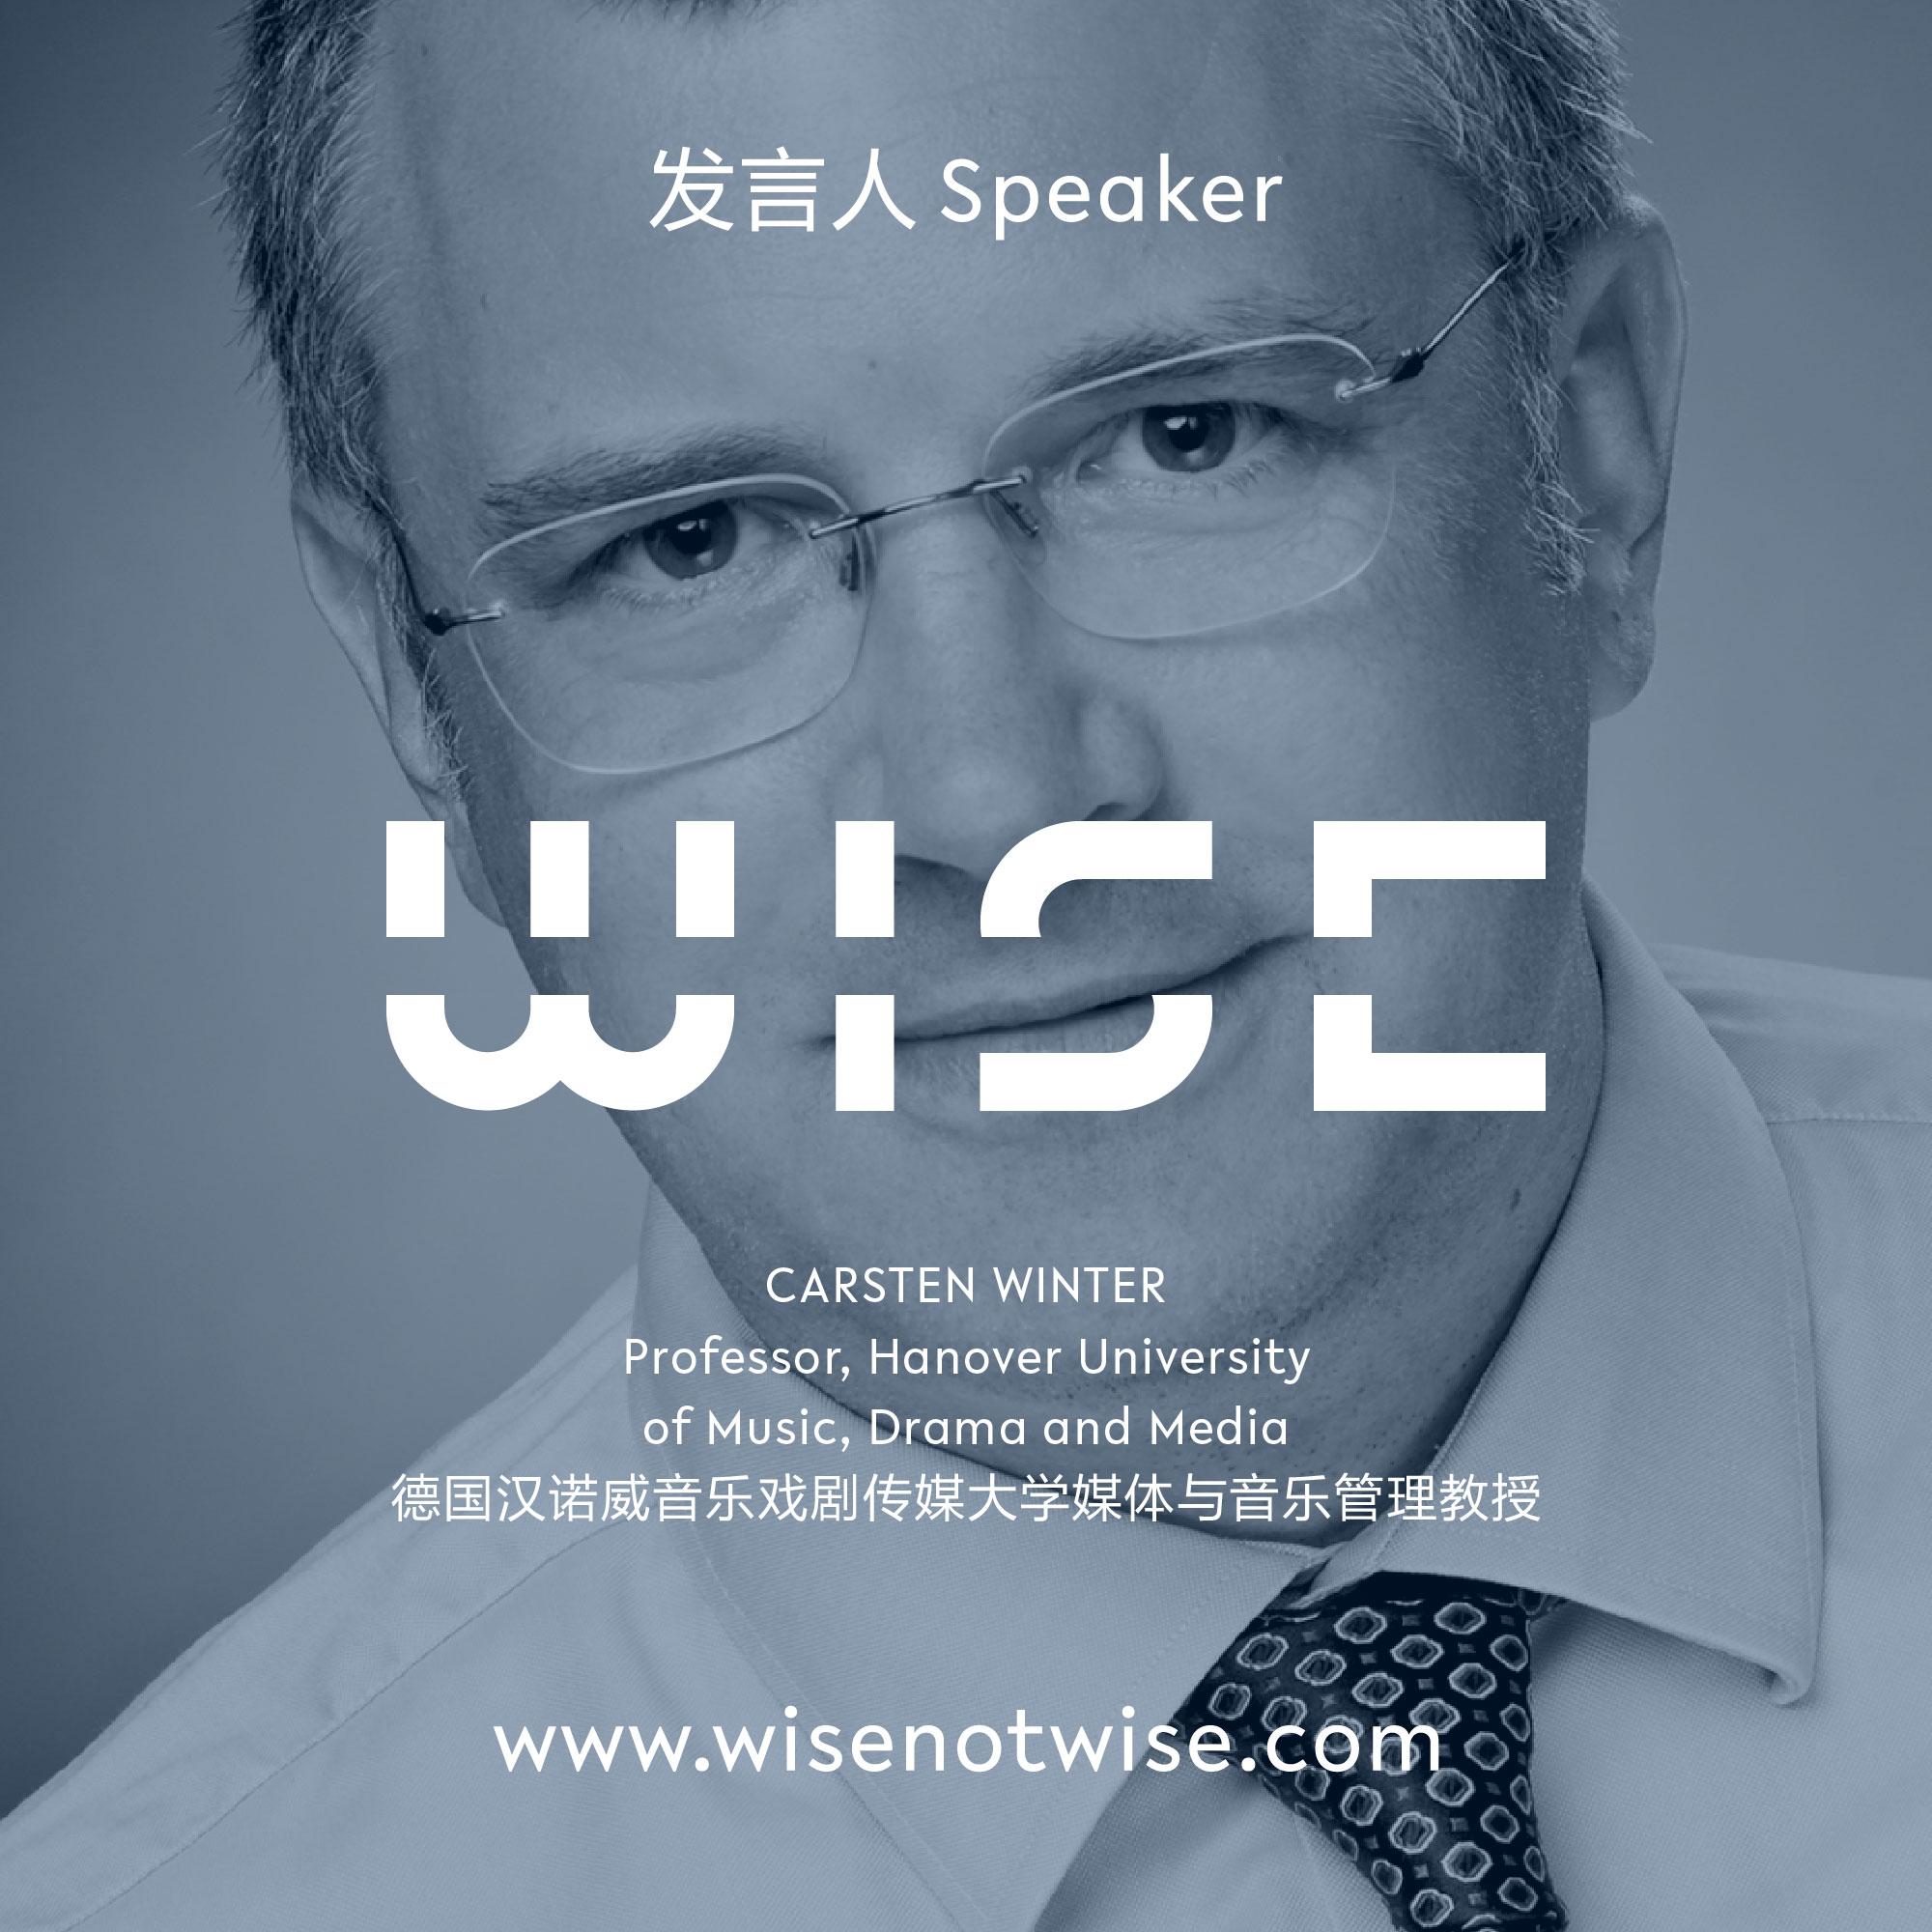 Carsten Winter (Professor at Hanover University of Music)